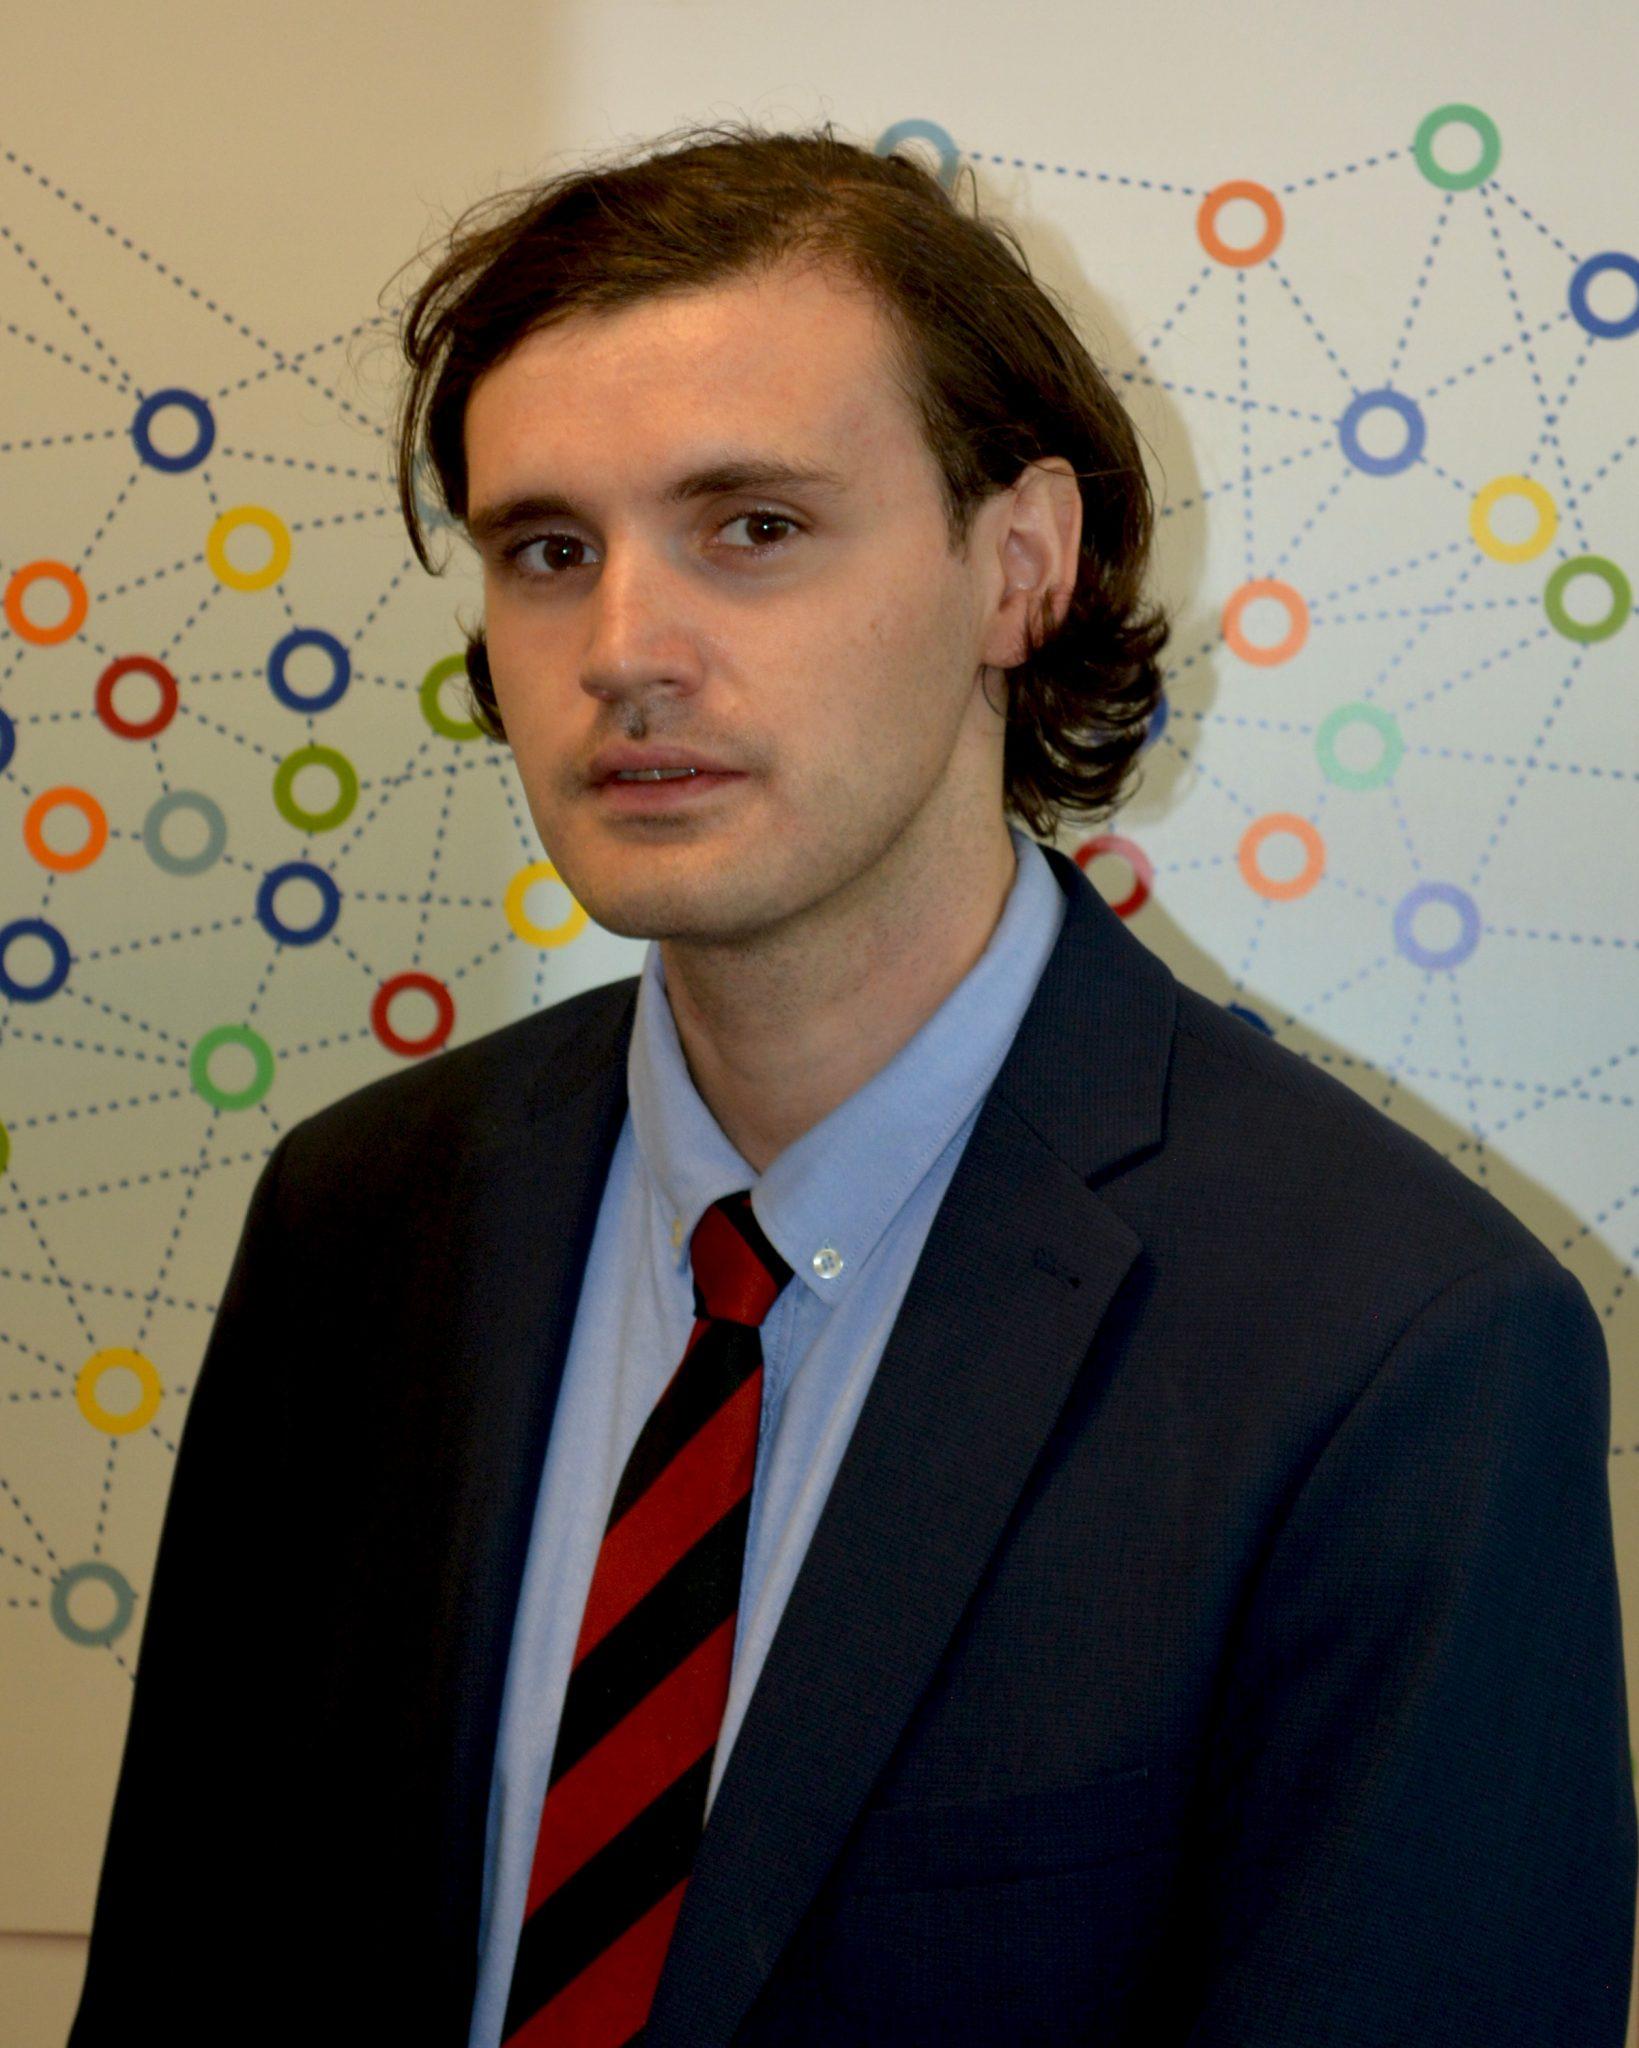 Jakub Libiszewski